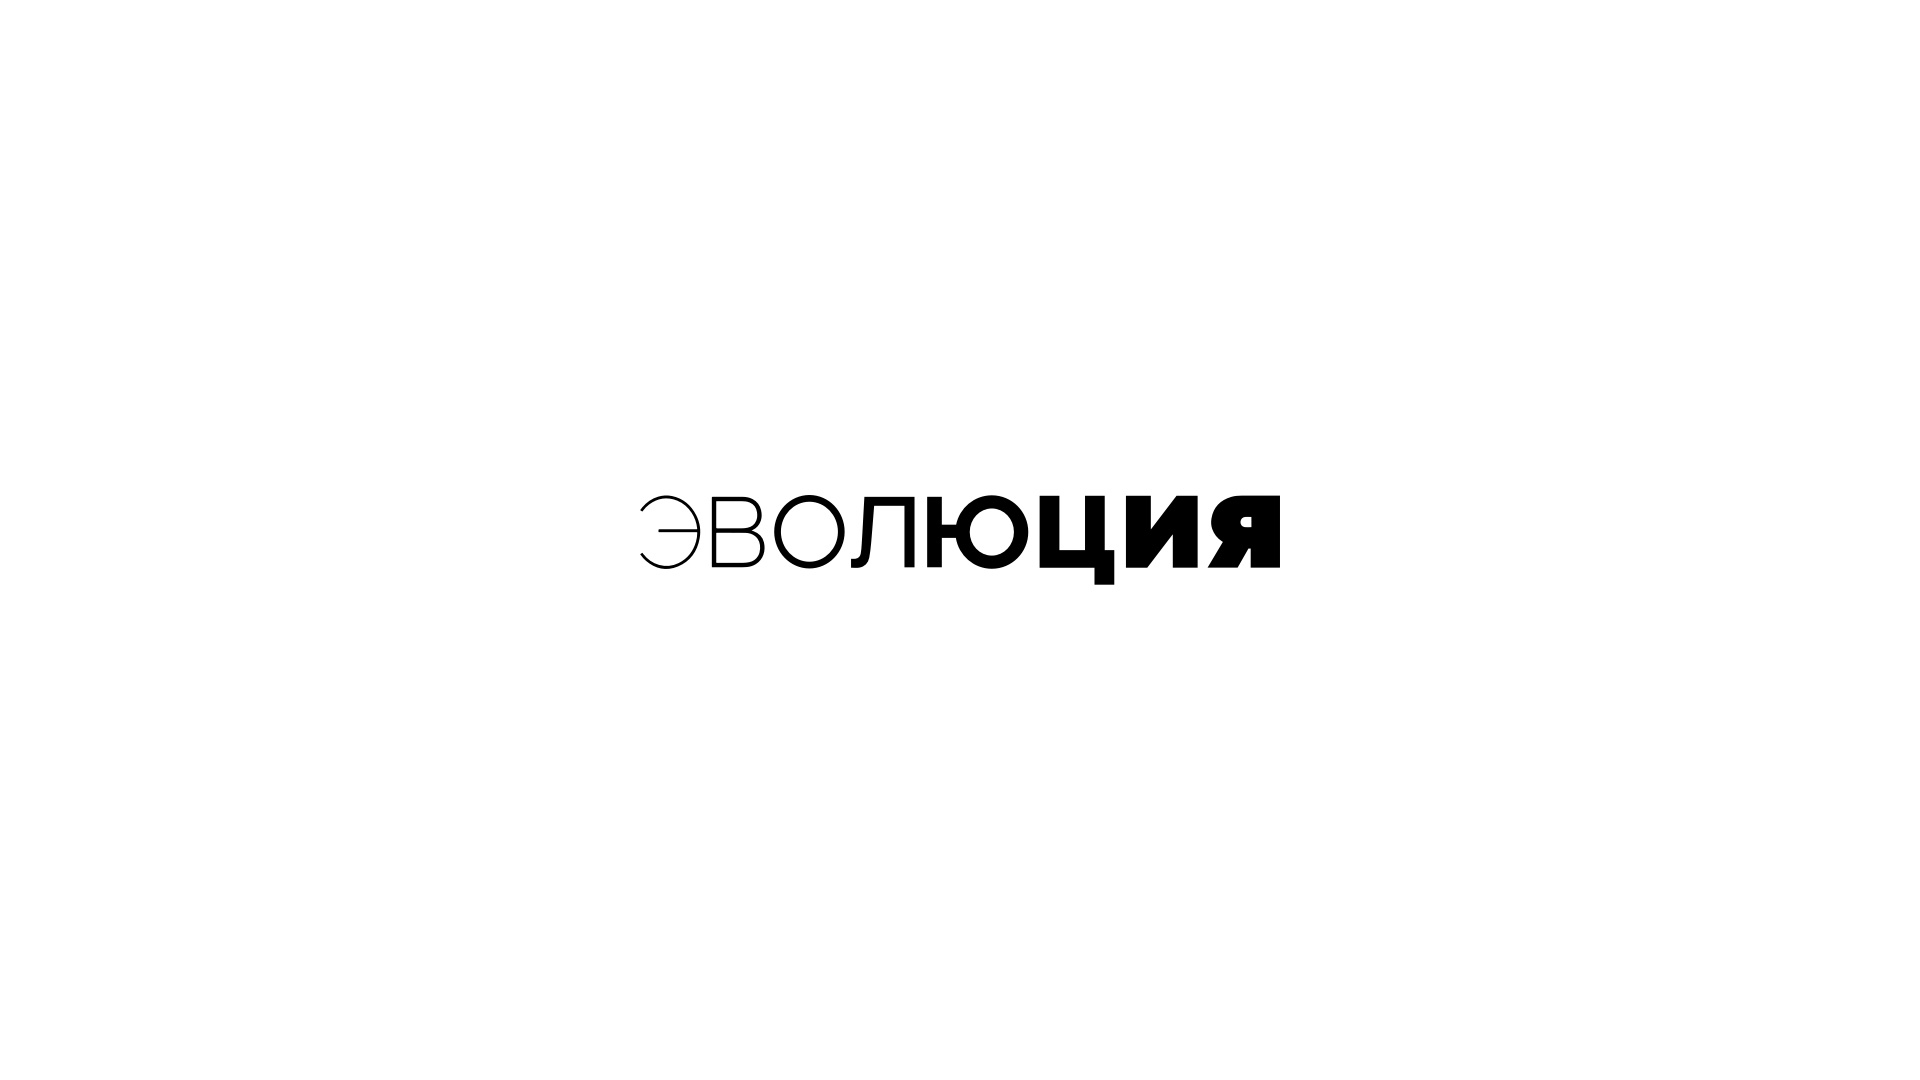 Разработать логотип для Онлайн-школы и сообщества фото f_8365bc18e520cc7a.jpg